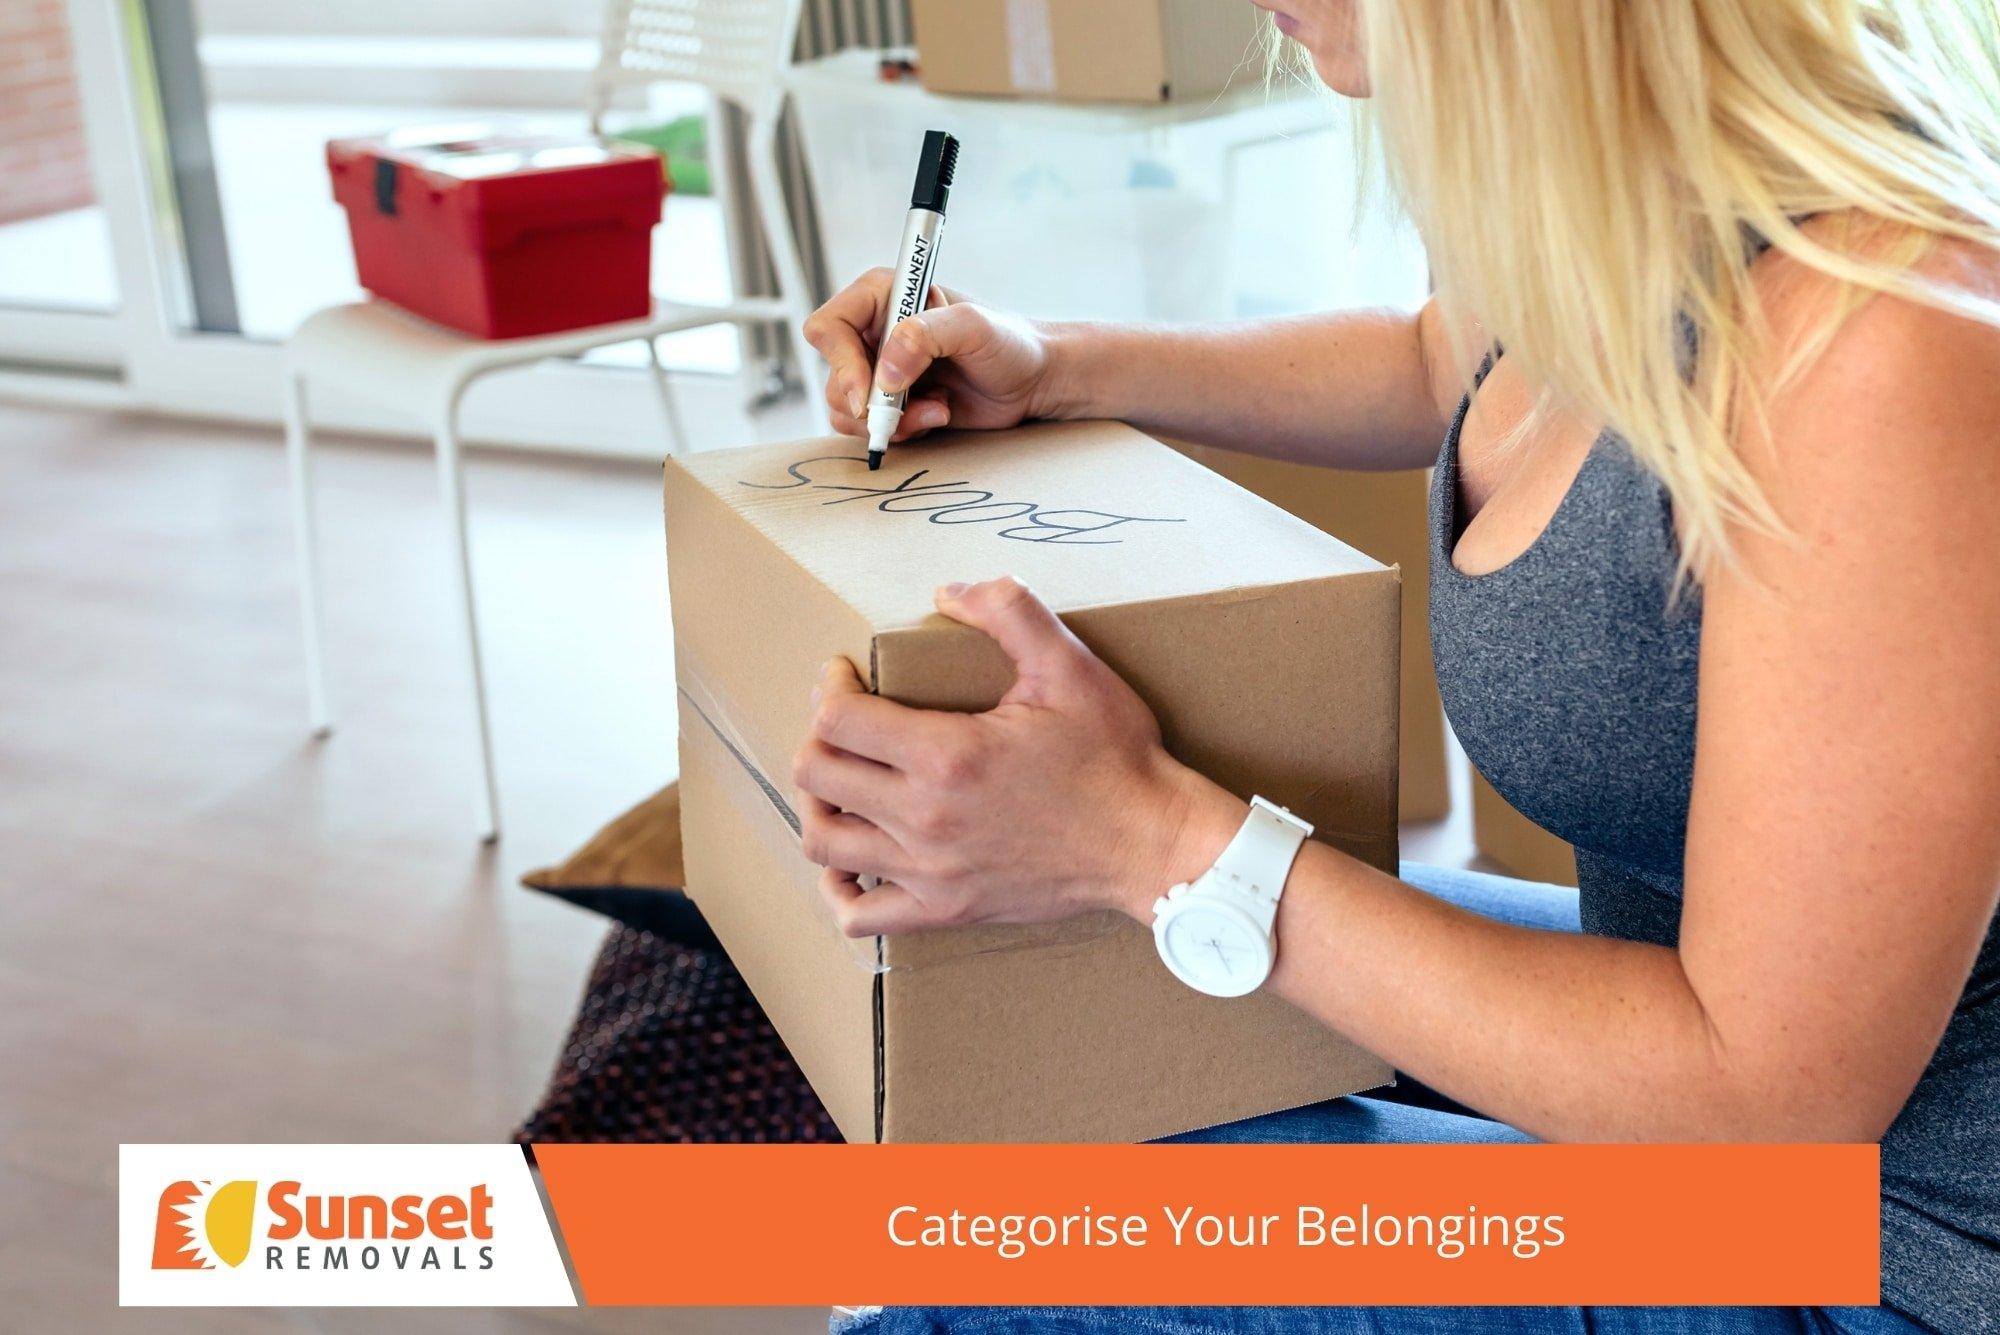 Categorise Your Belongings